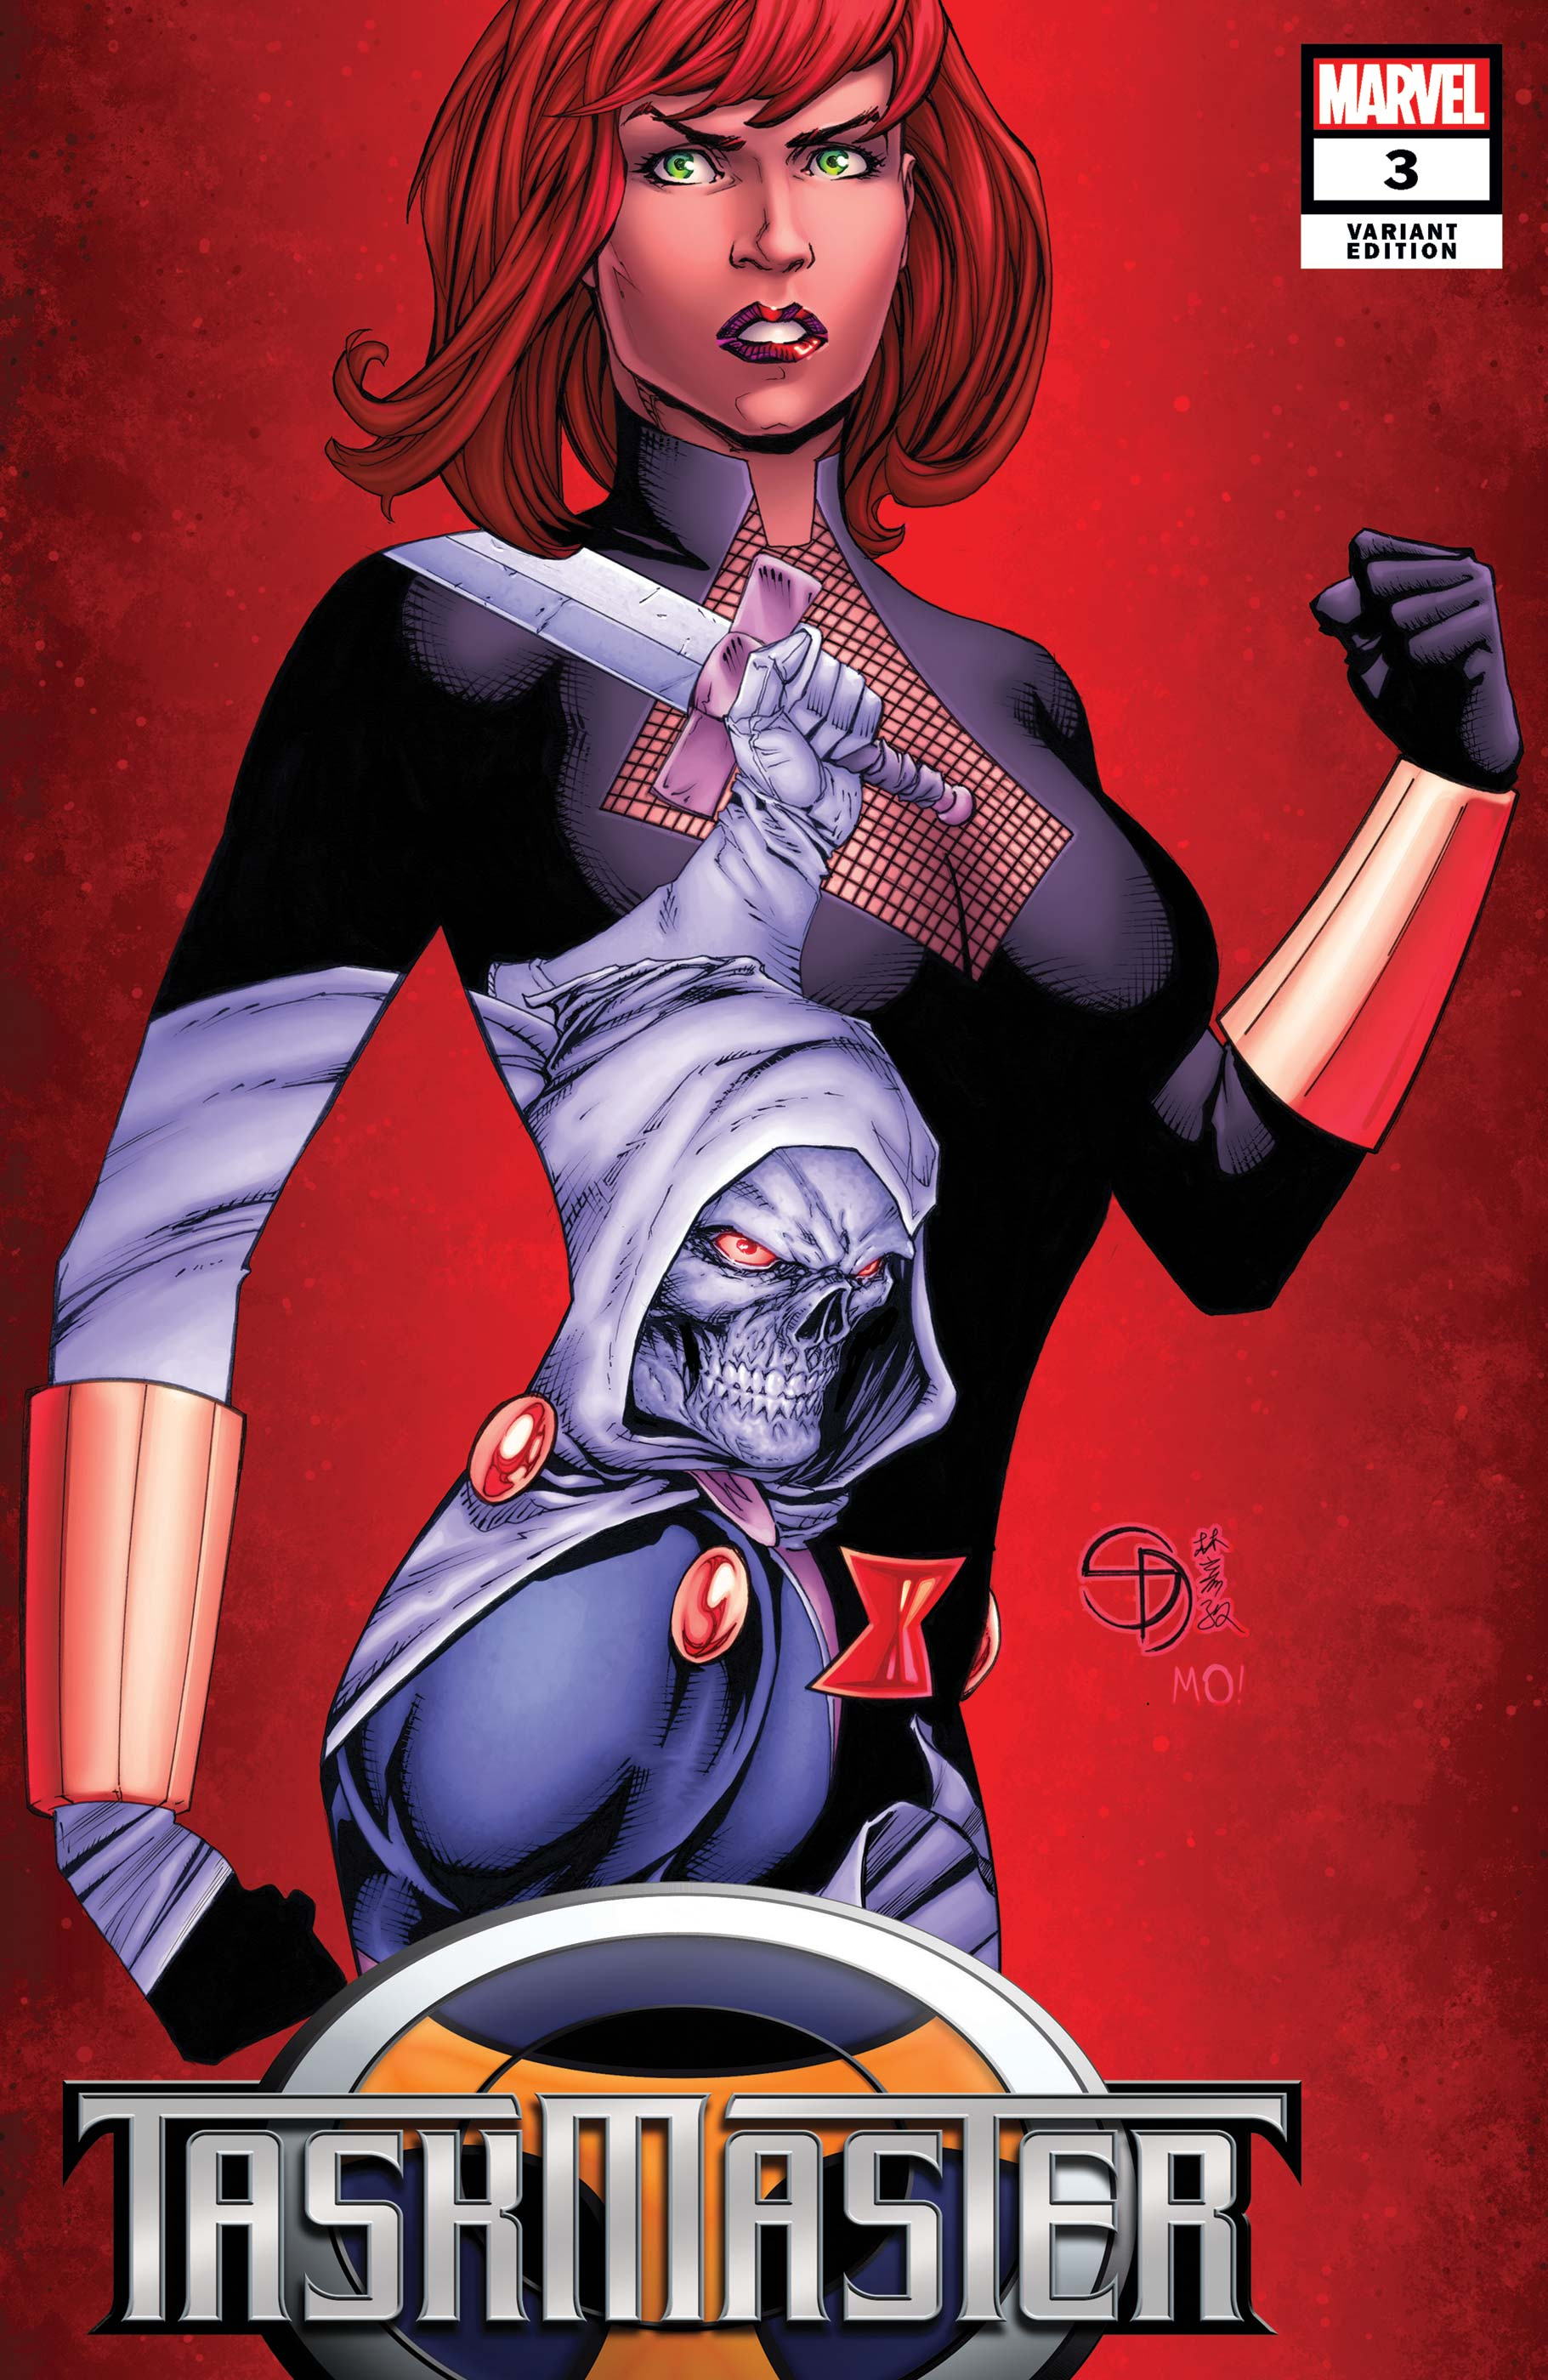 Taskmaster (2020) #3 (Variant)